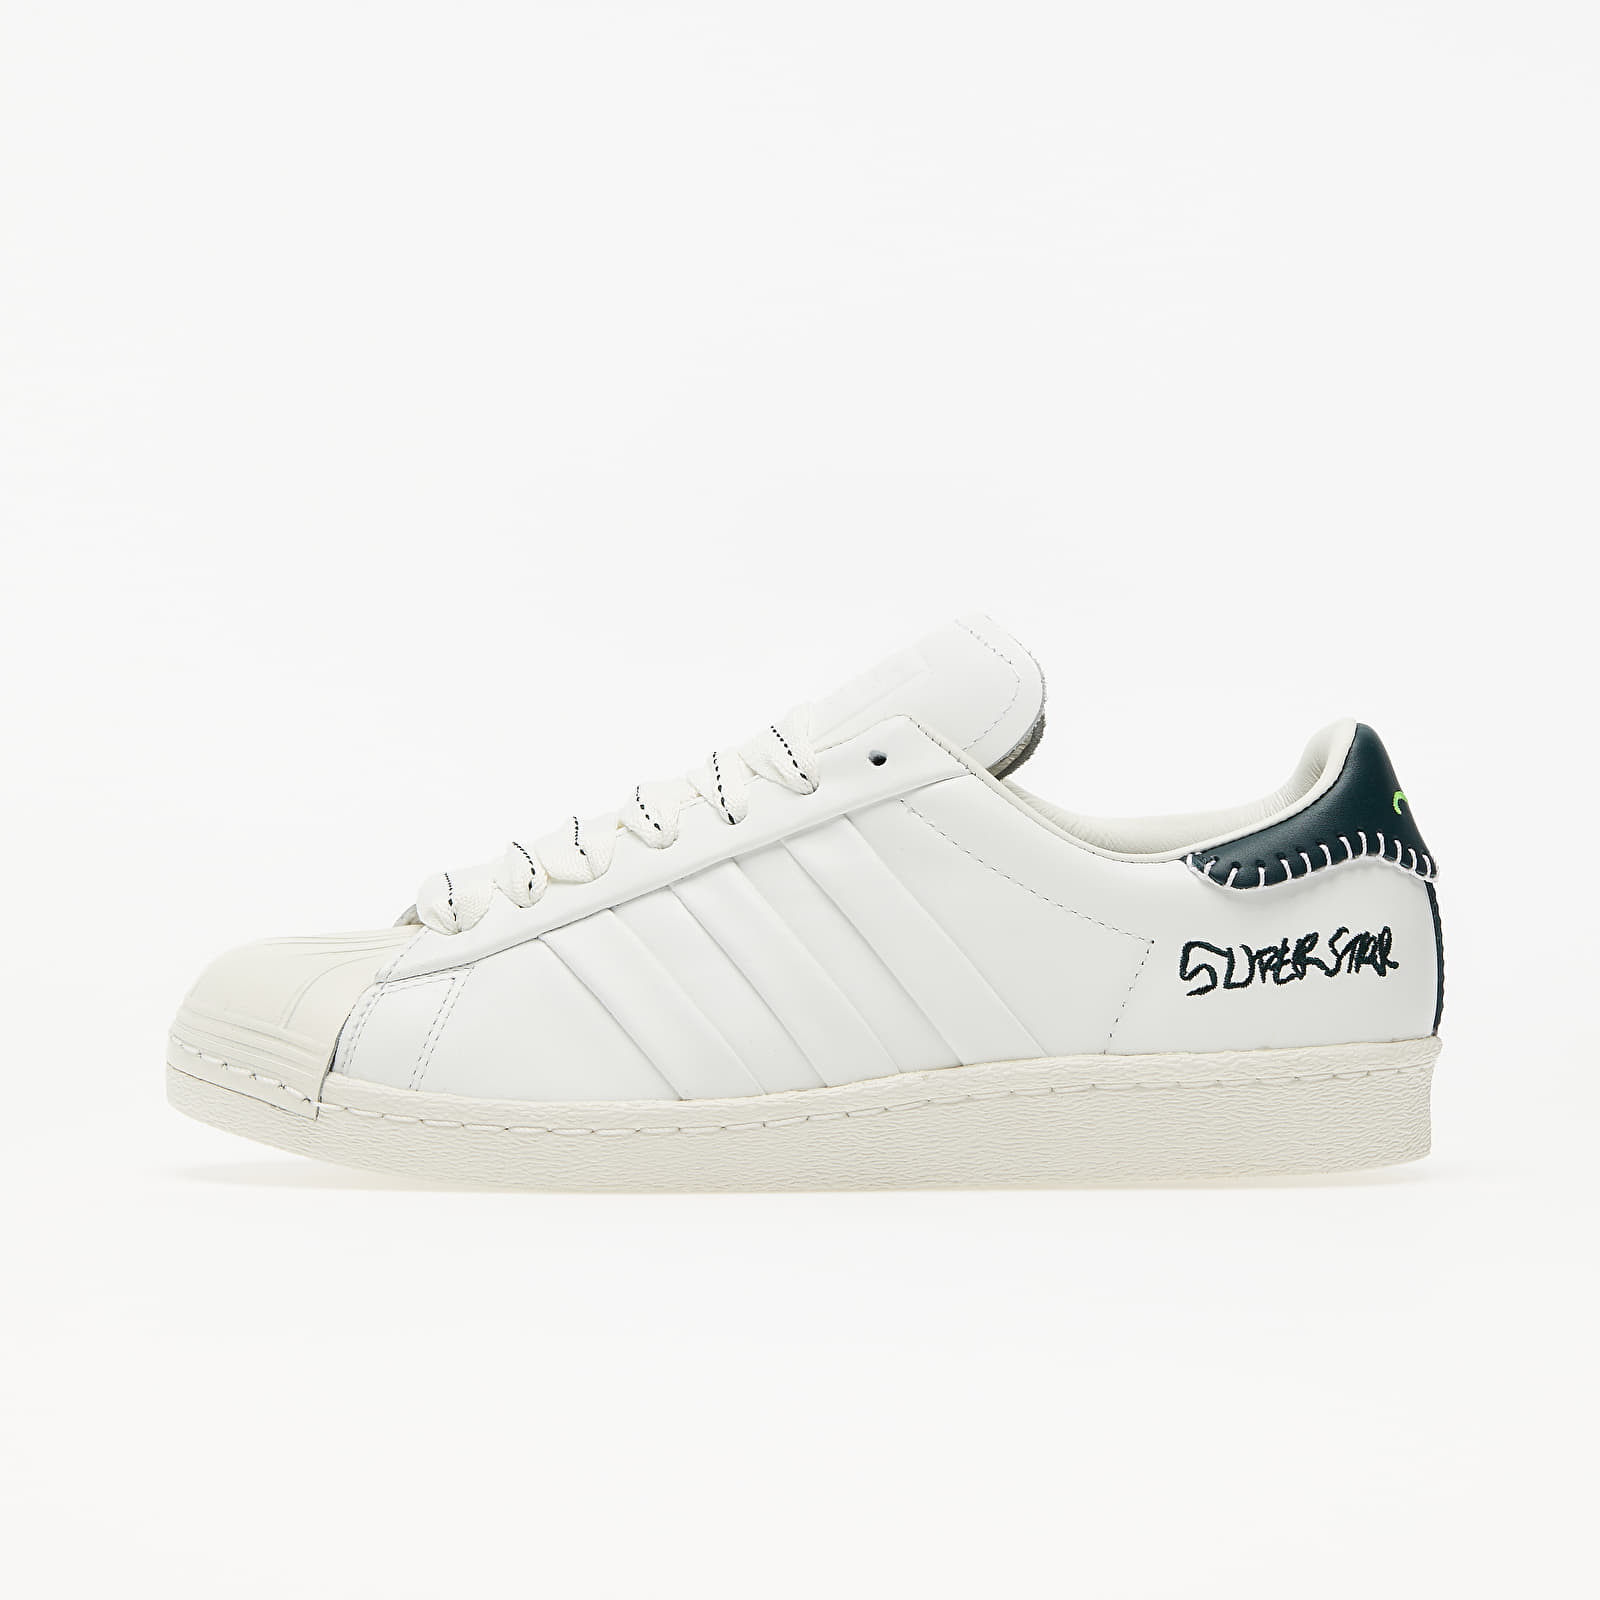 Pánské tenisky a boty adidas x Jonah Hill Superstar Core White/ Green Night F17/ Off White